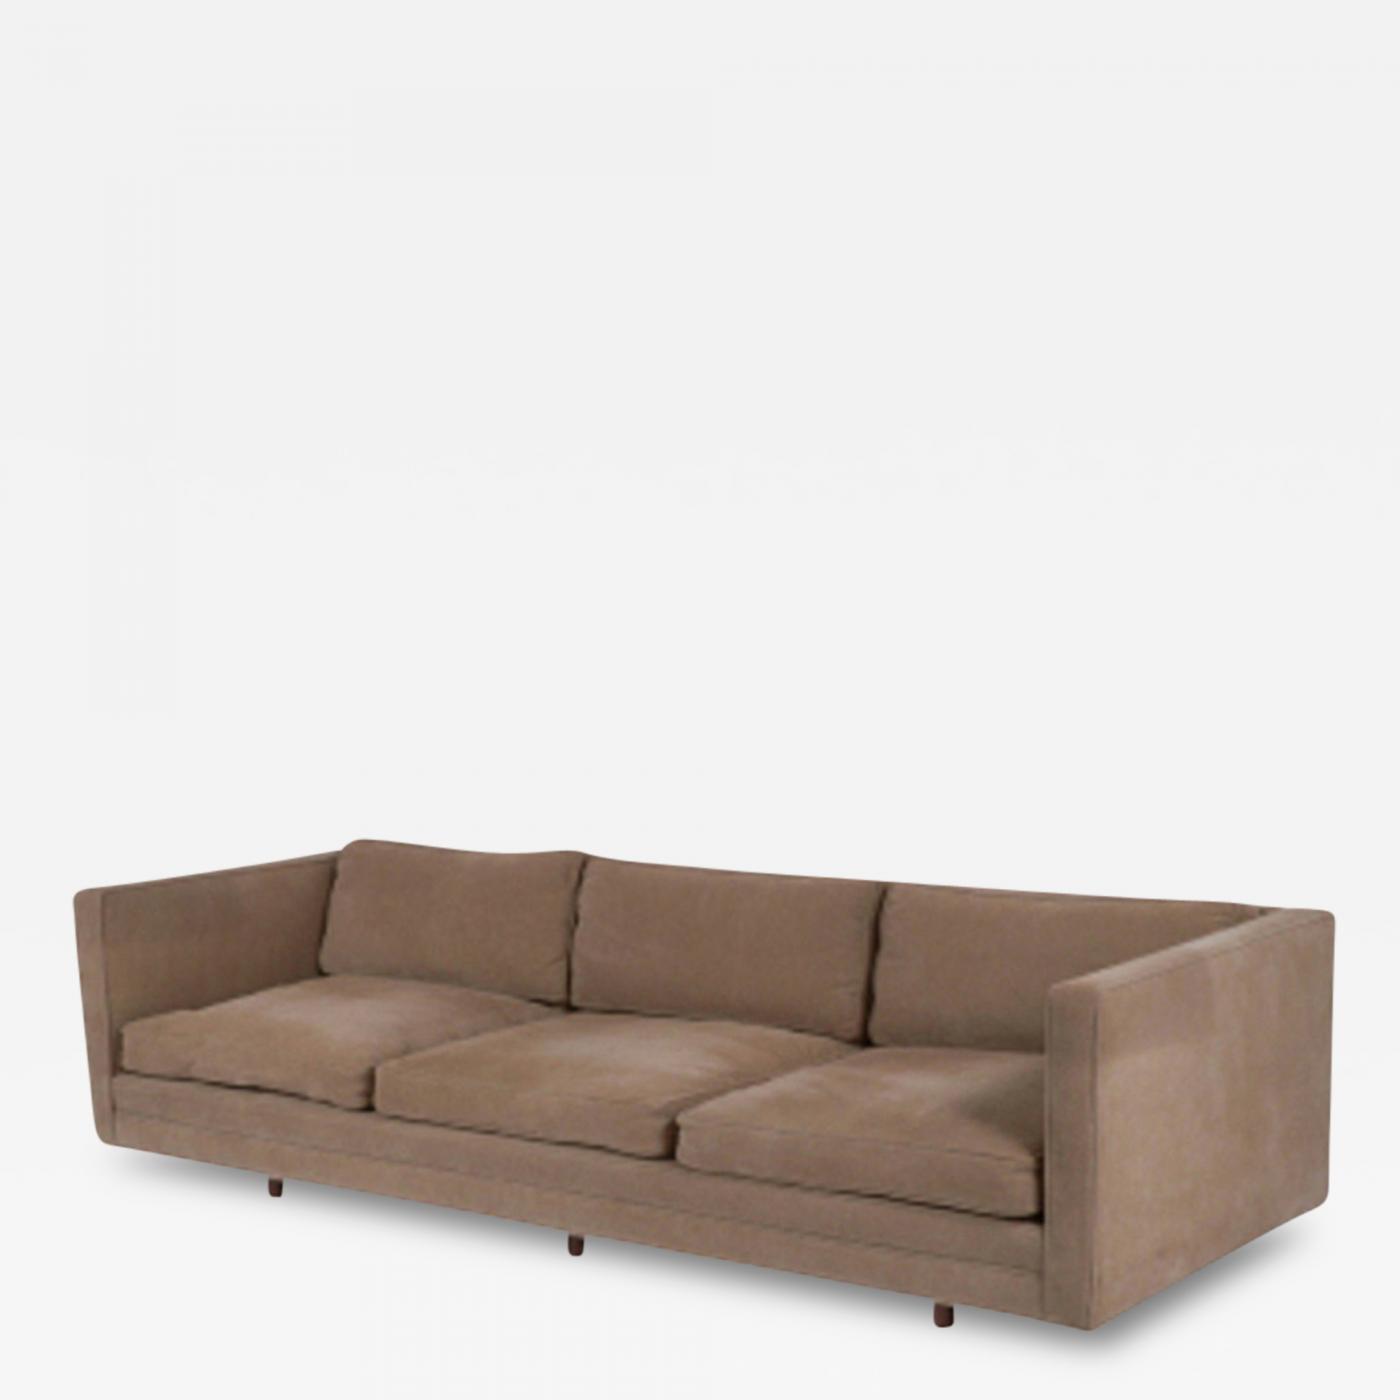 Ordinaire Listings / Furniture / Seating / Sofas